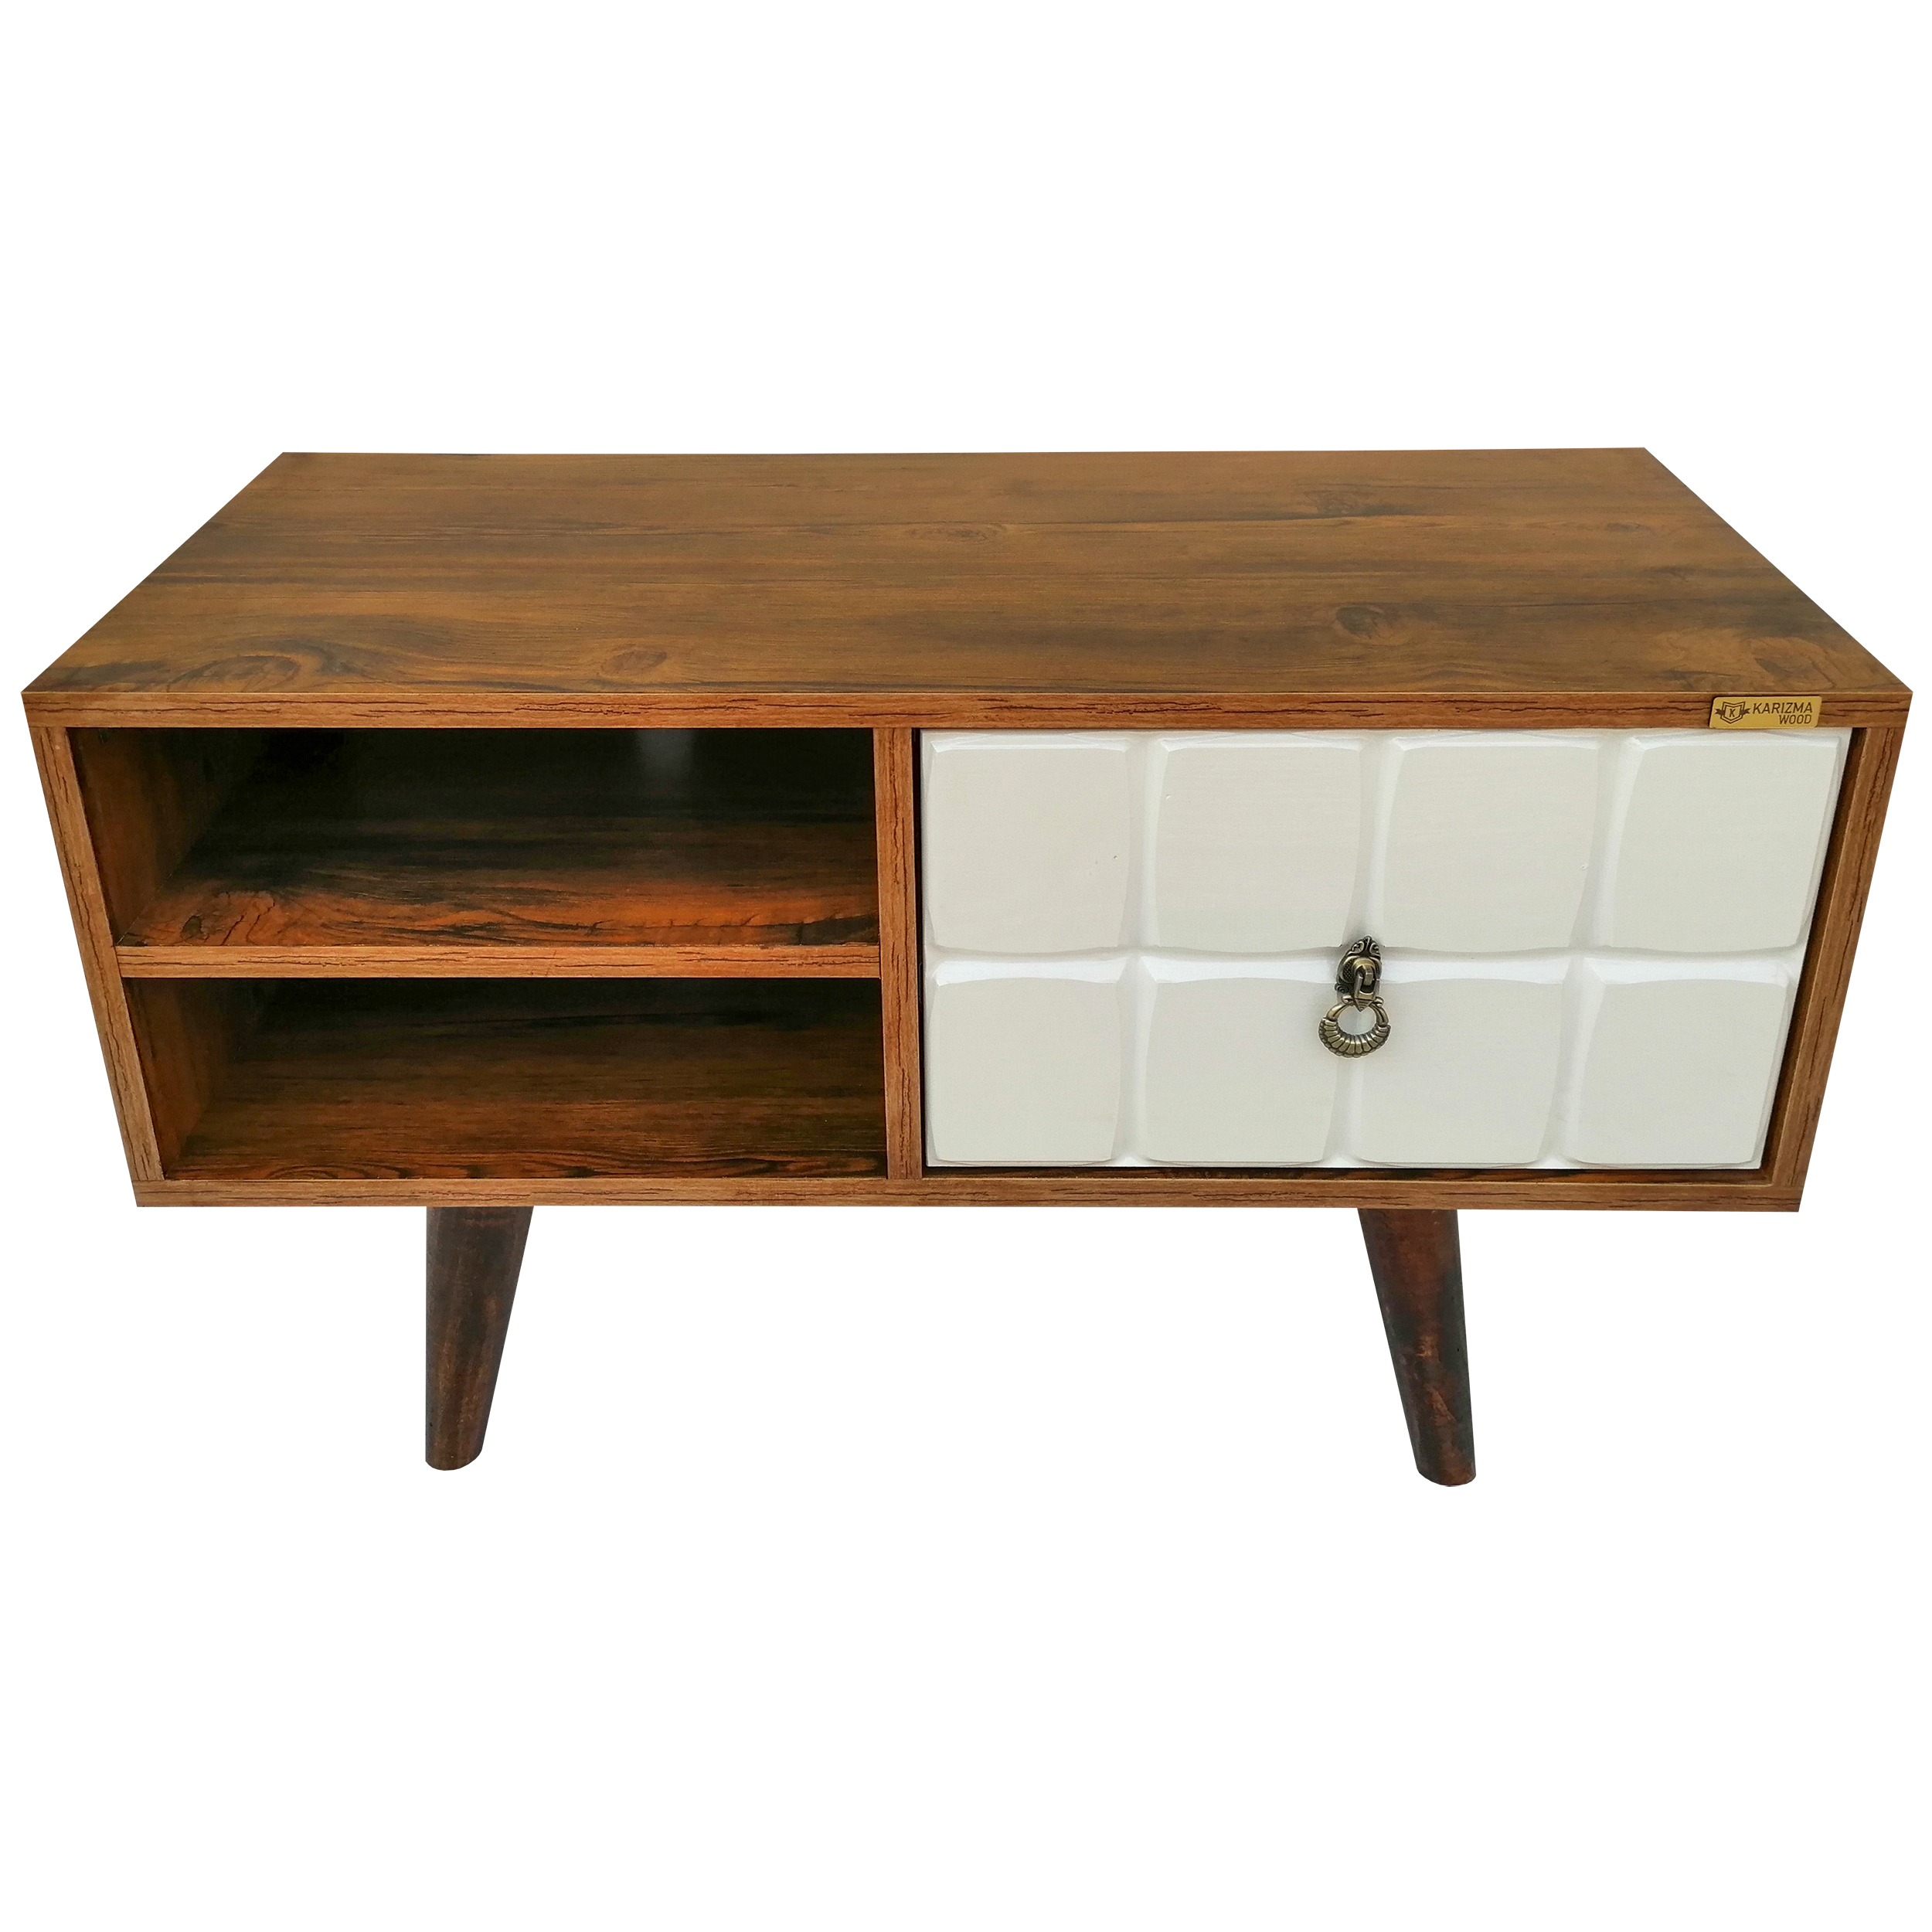 میز تلویزیون کاریزما وود مدل A.KMW200